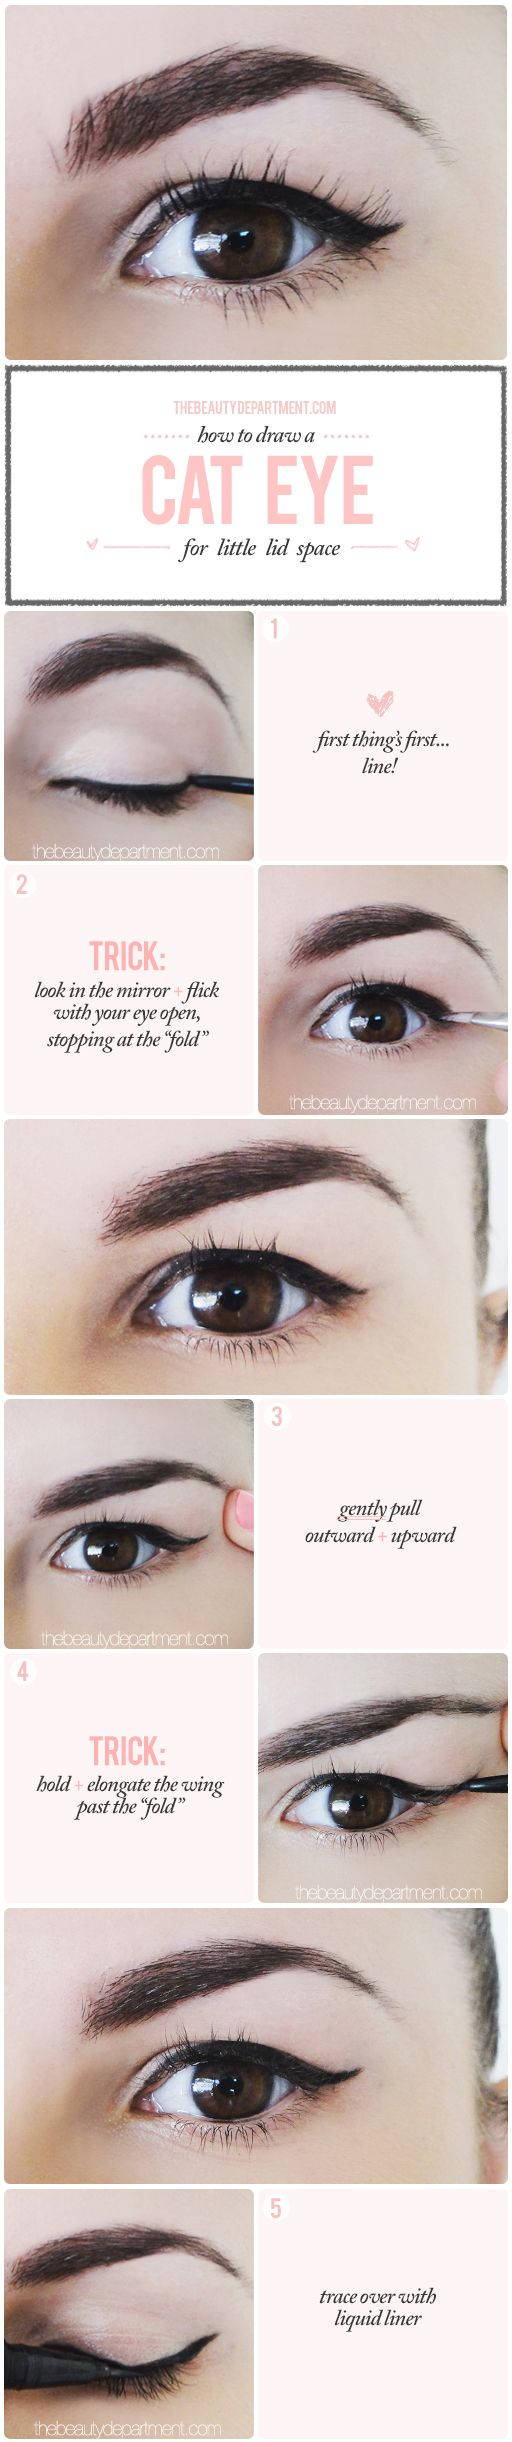 Winged Liner For A Droopy Lid Makeup Eyeliner Hooded Eye Makeup Eye Makeup